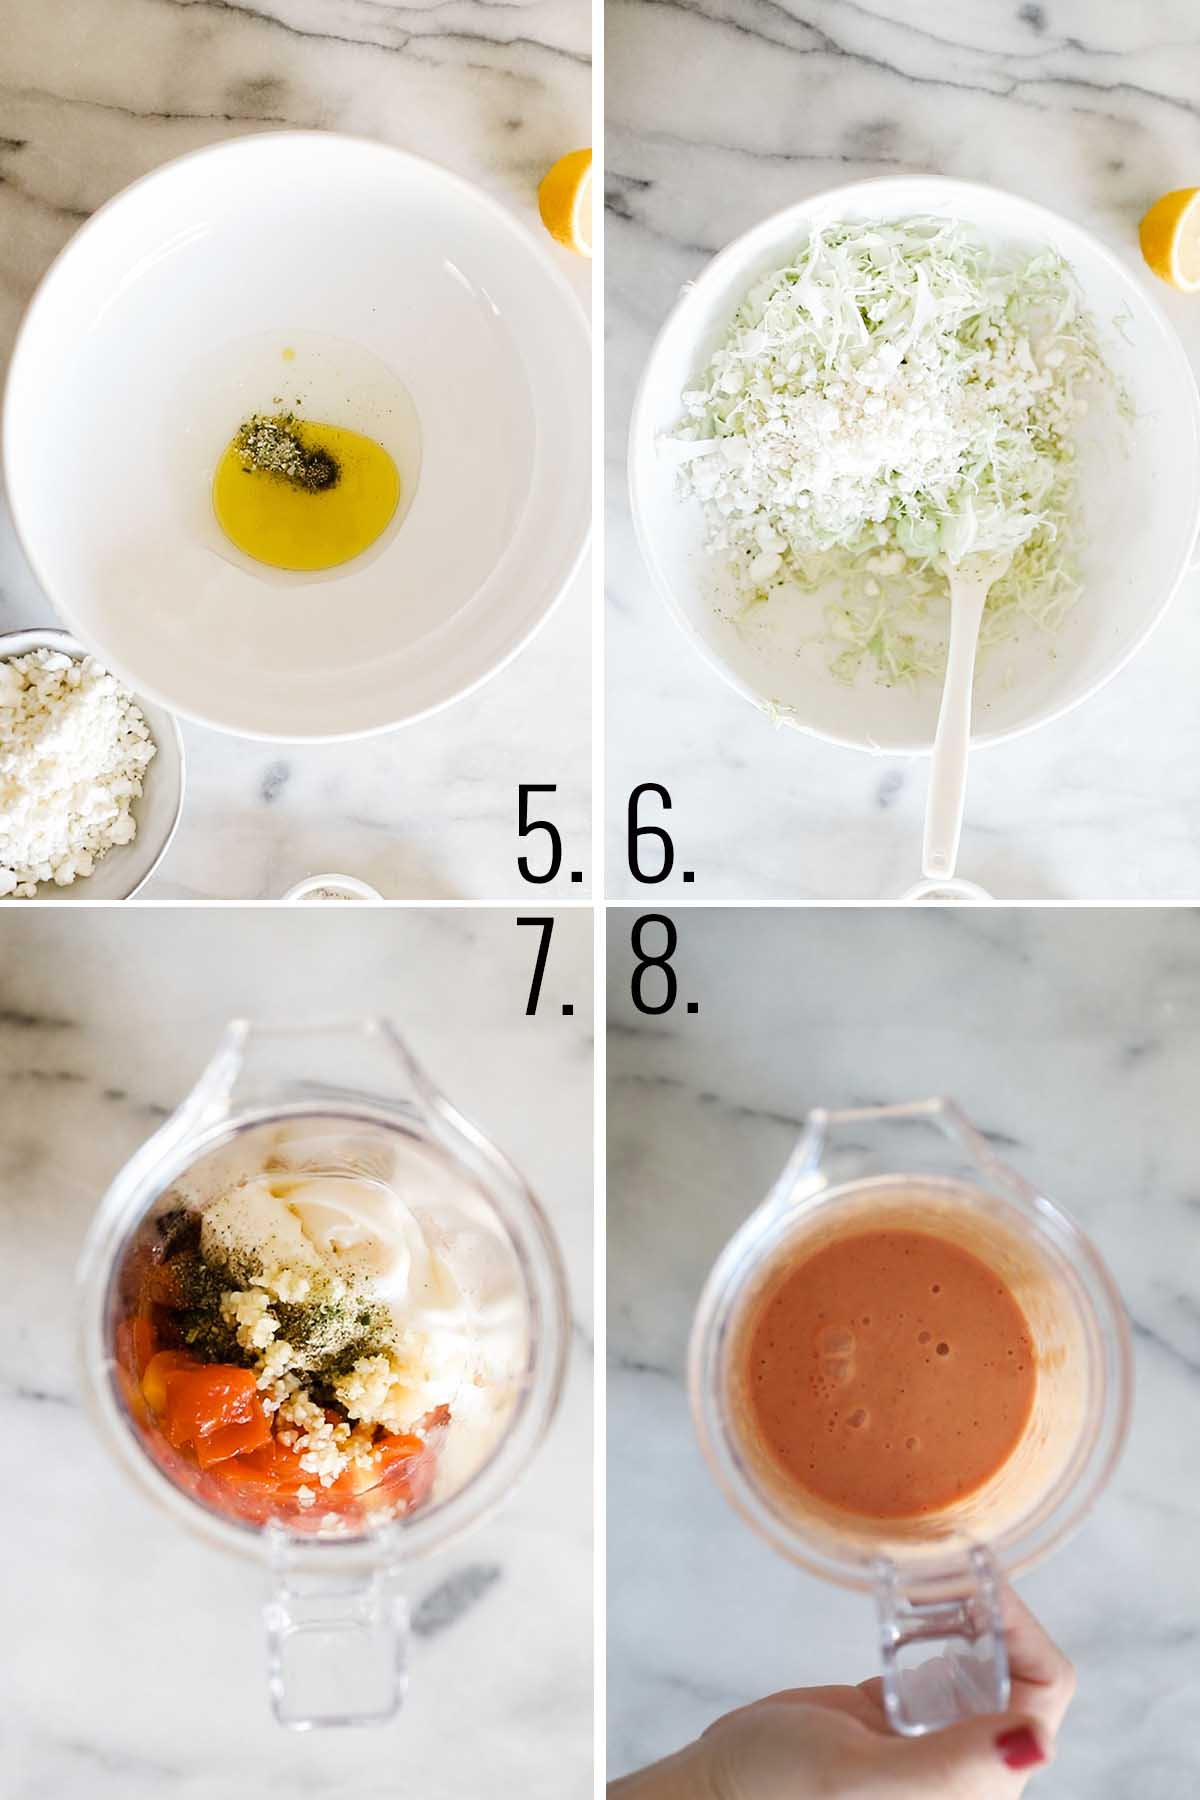 How to make feta slaw and tomato aioli.